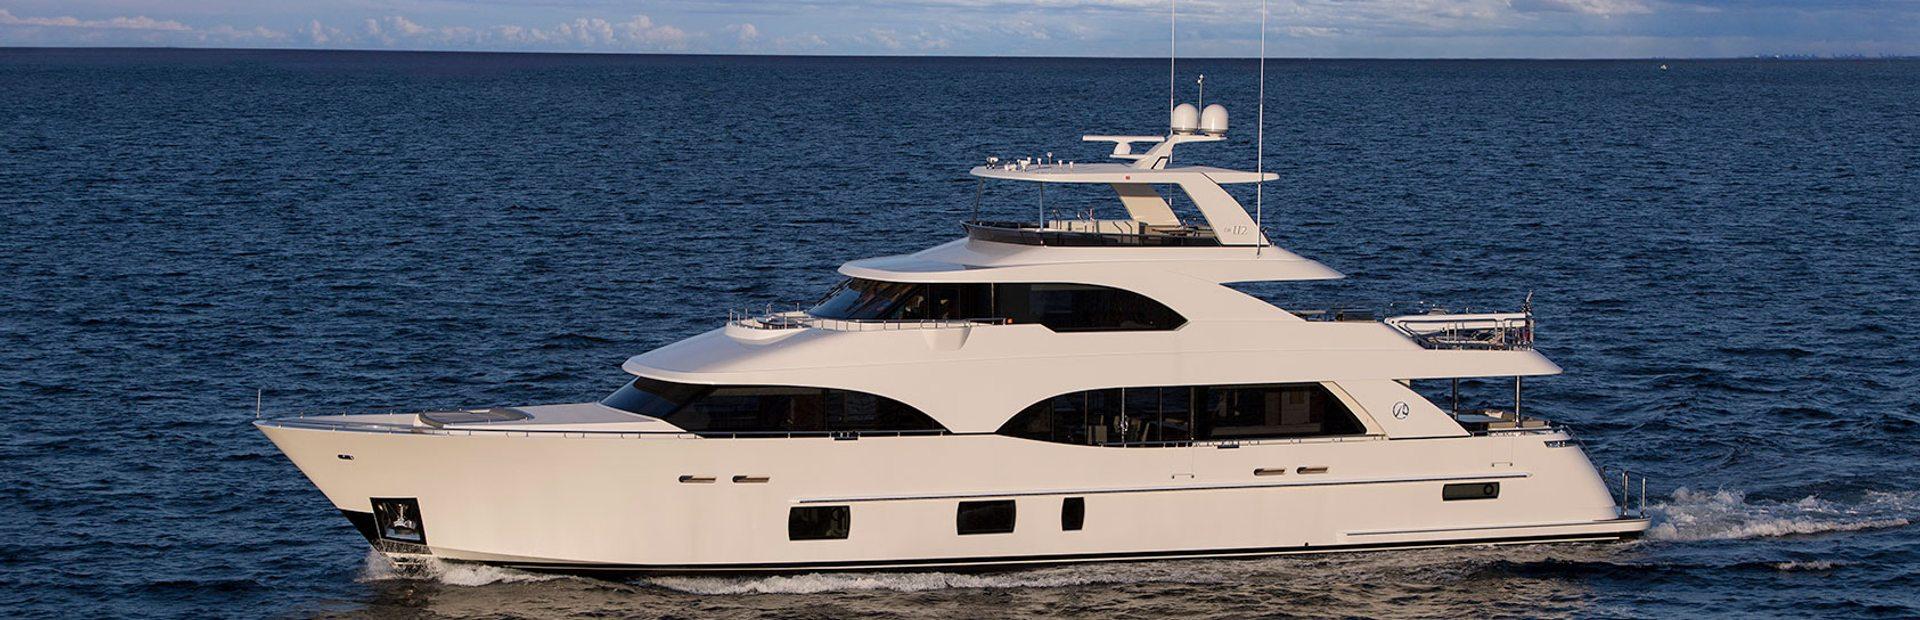 36L Yacht Charter